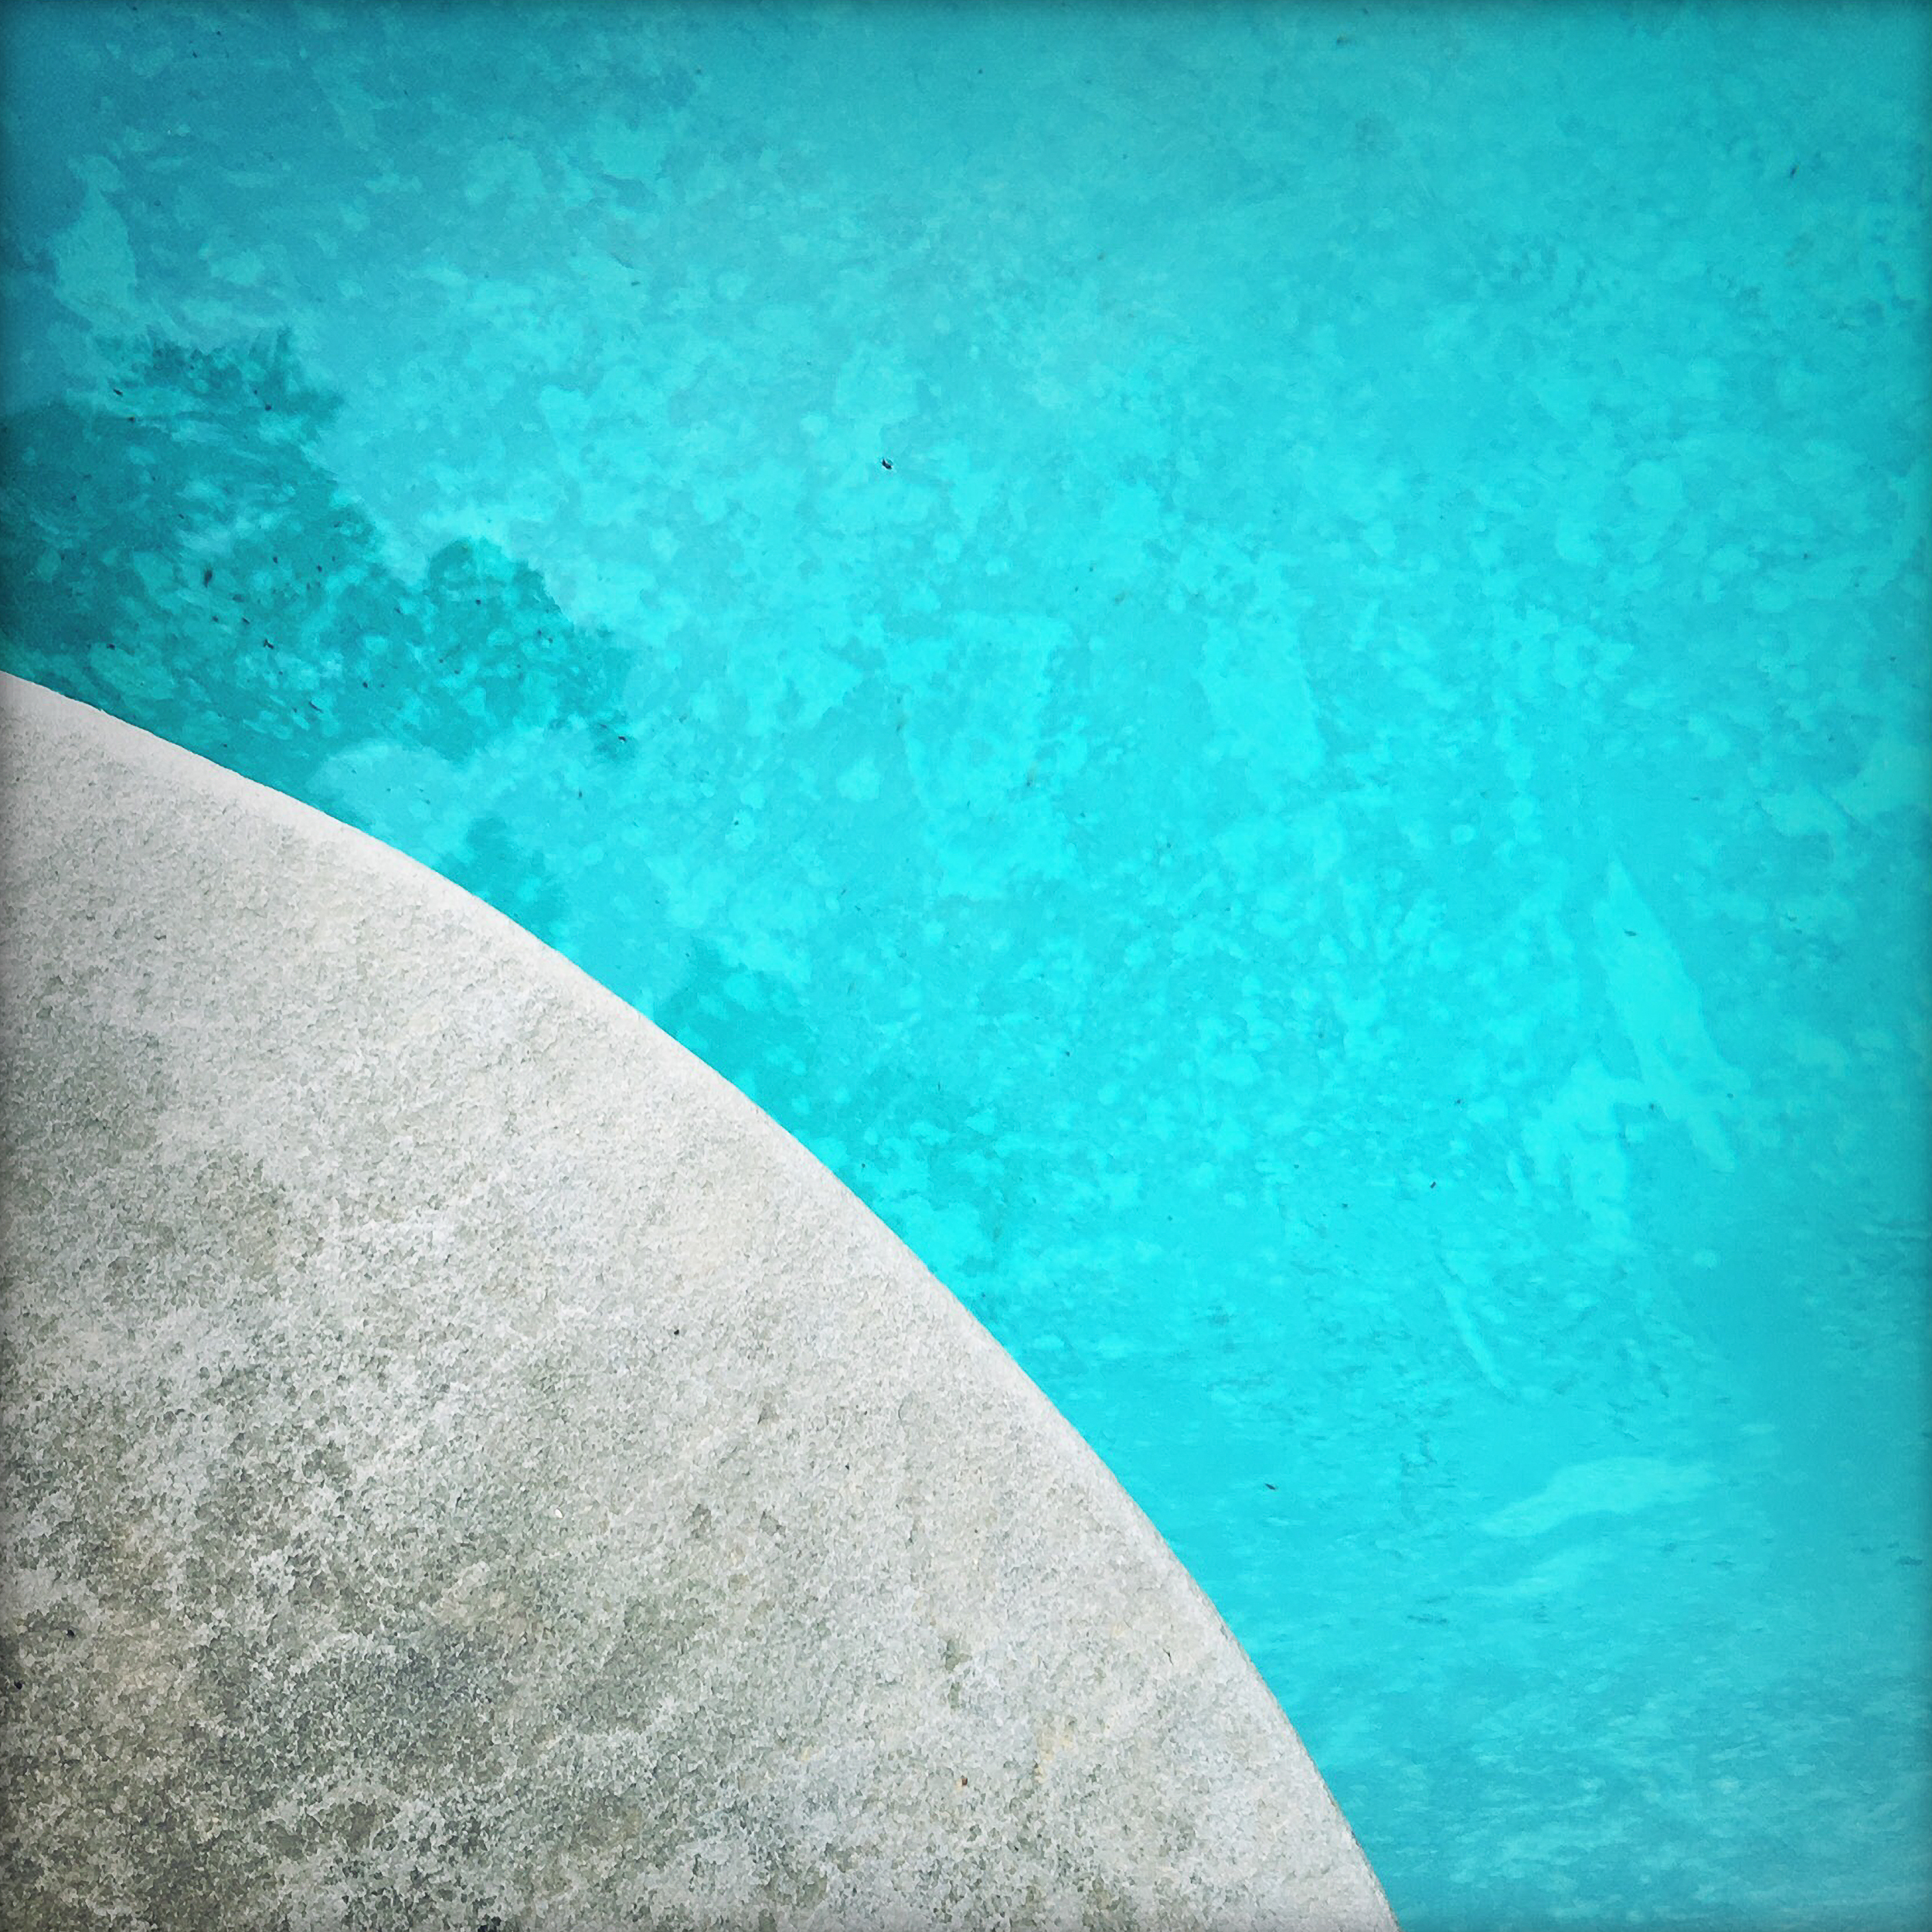 Pool Step Series V